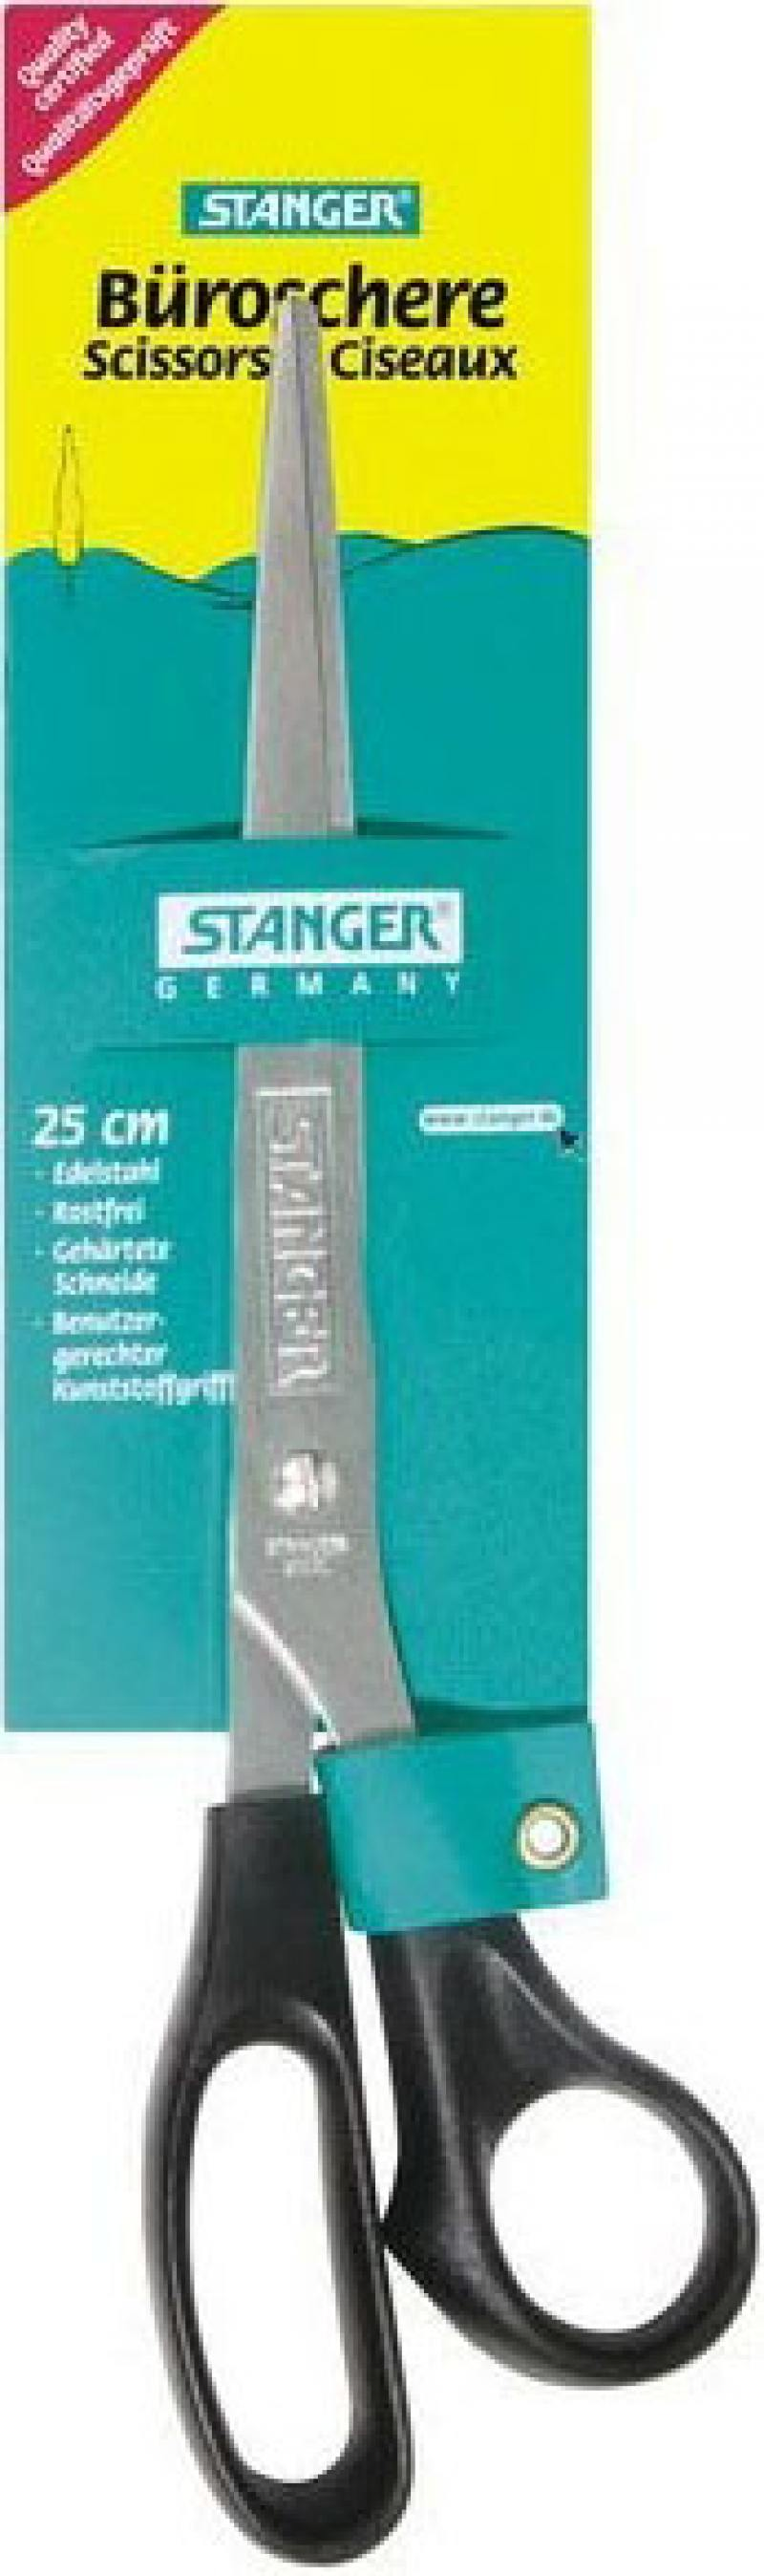 Ножницы Stanger 34103 12.5 см ножницы stanger 34103 12 5 см